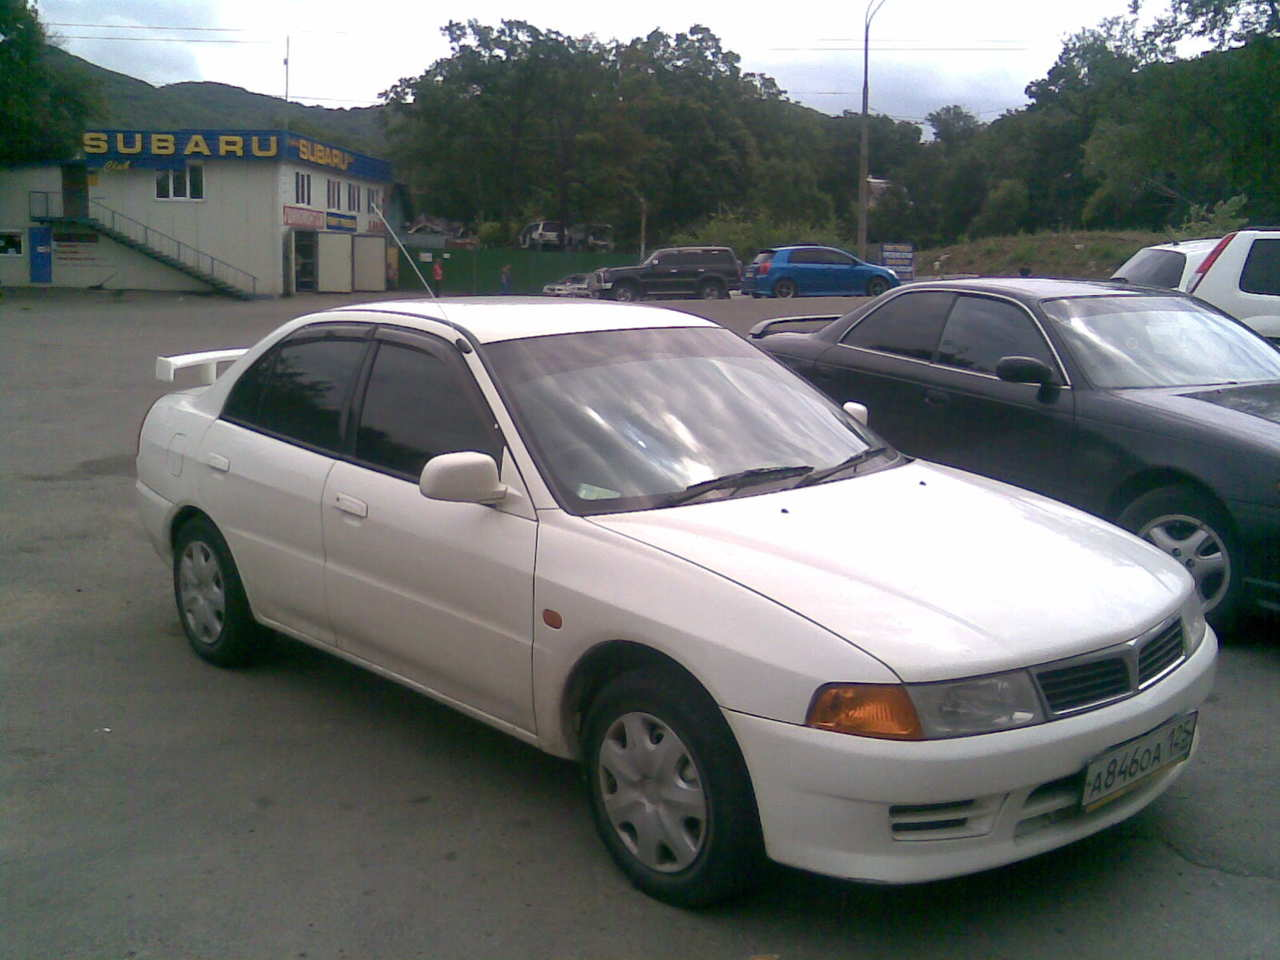 1997 mitsubishi lancer pictures 1 5l gasoline ff automatic for sale